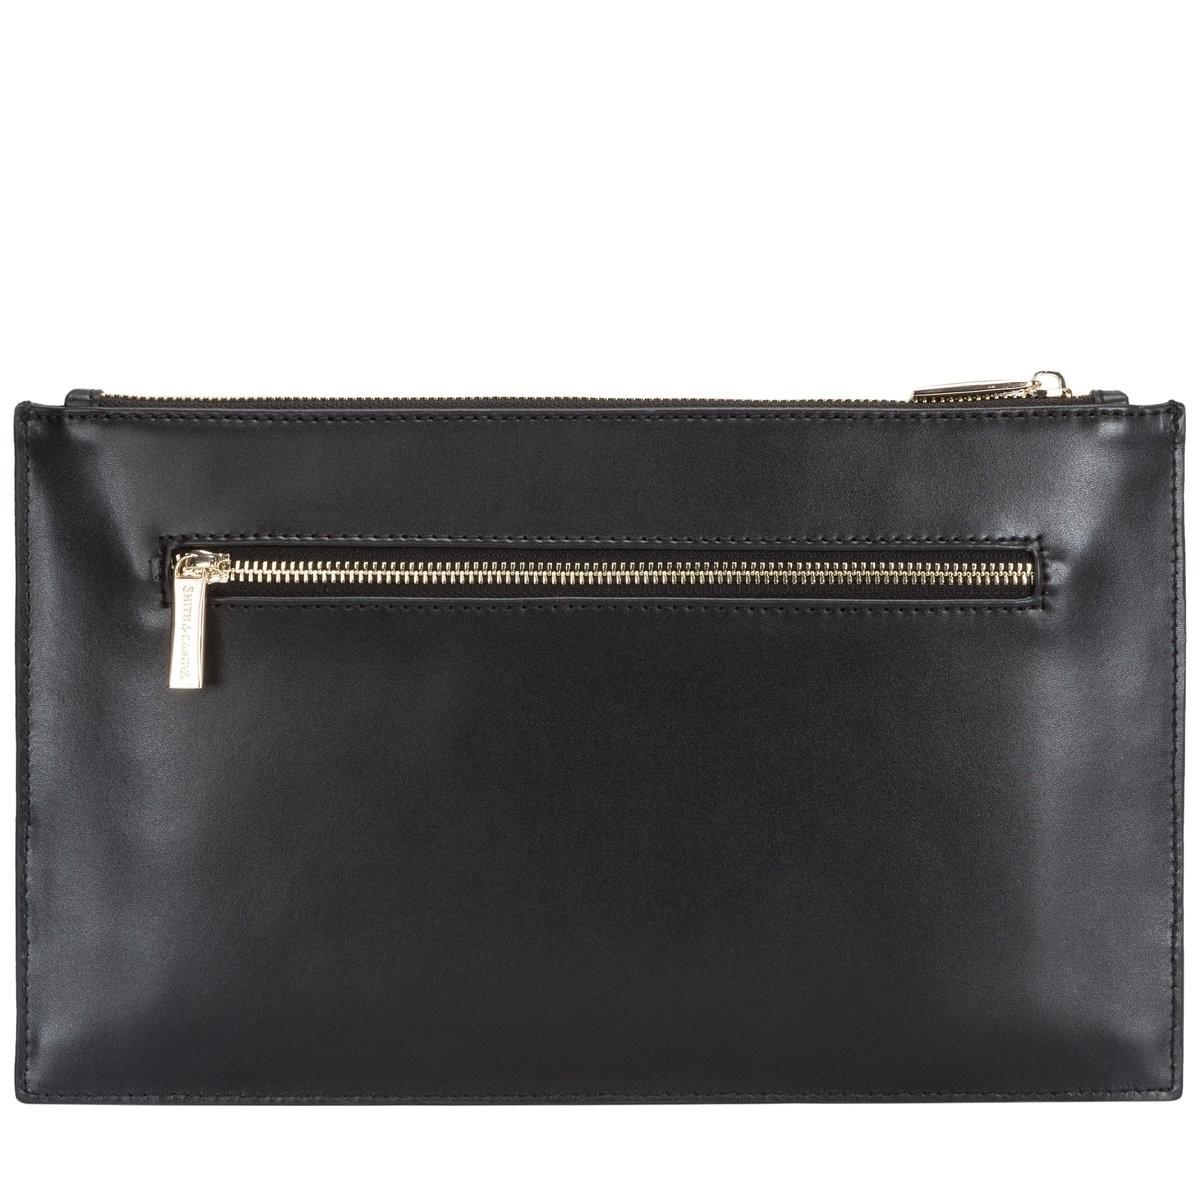 7dd2fbc8eb Smooth Leather Zip Top Clutch Bag - Smith & Canova